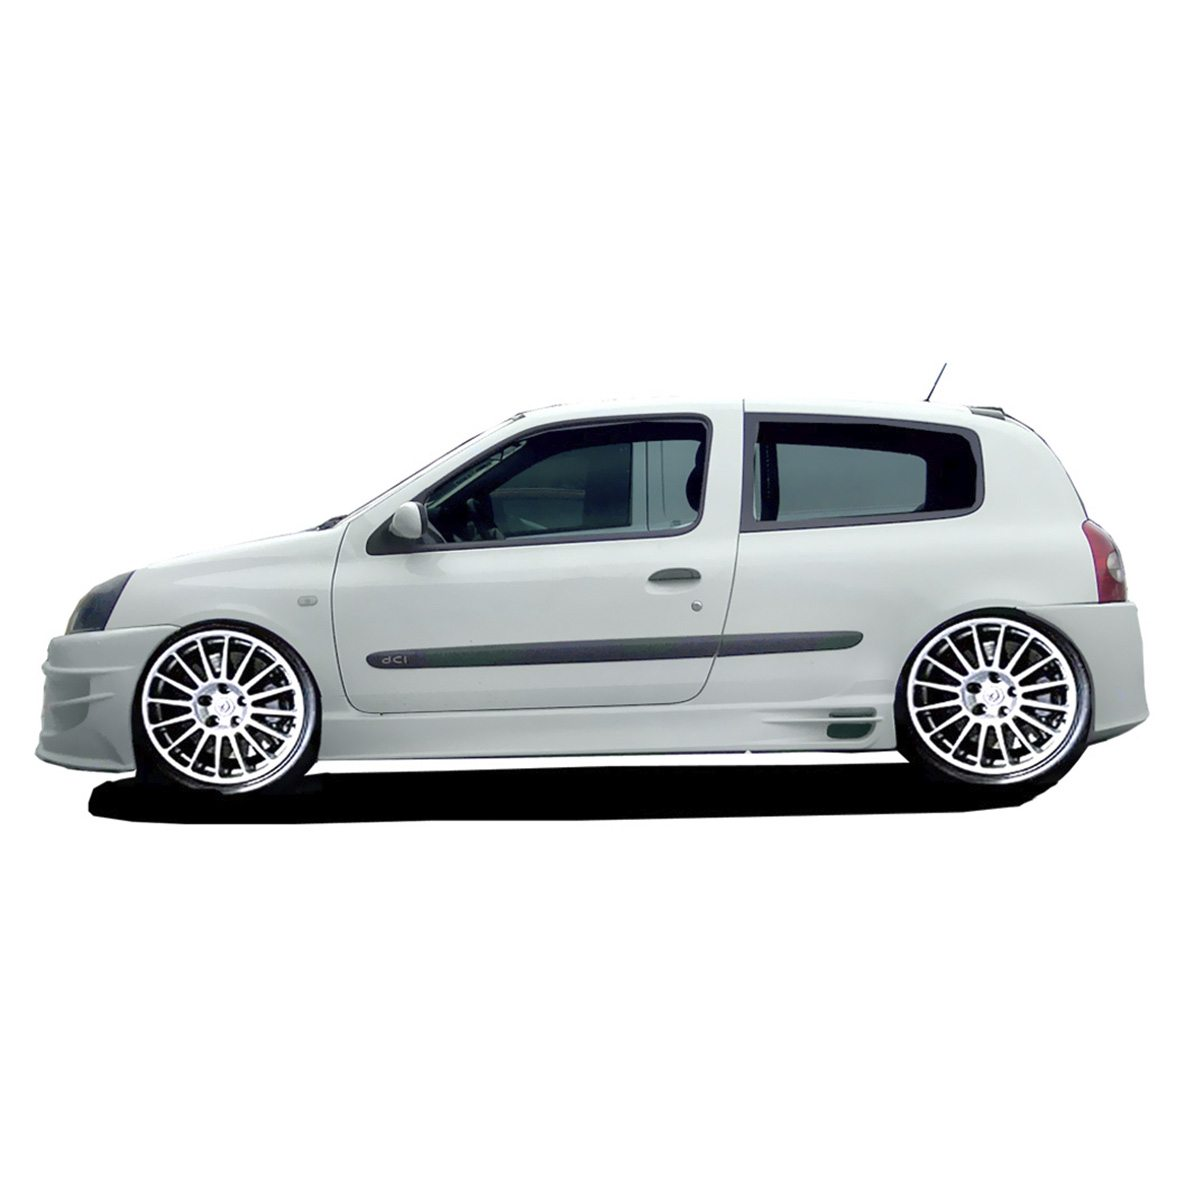 Renault-Clio-02-Nitro-Emb-EBU0481